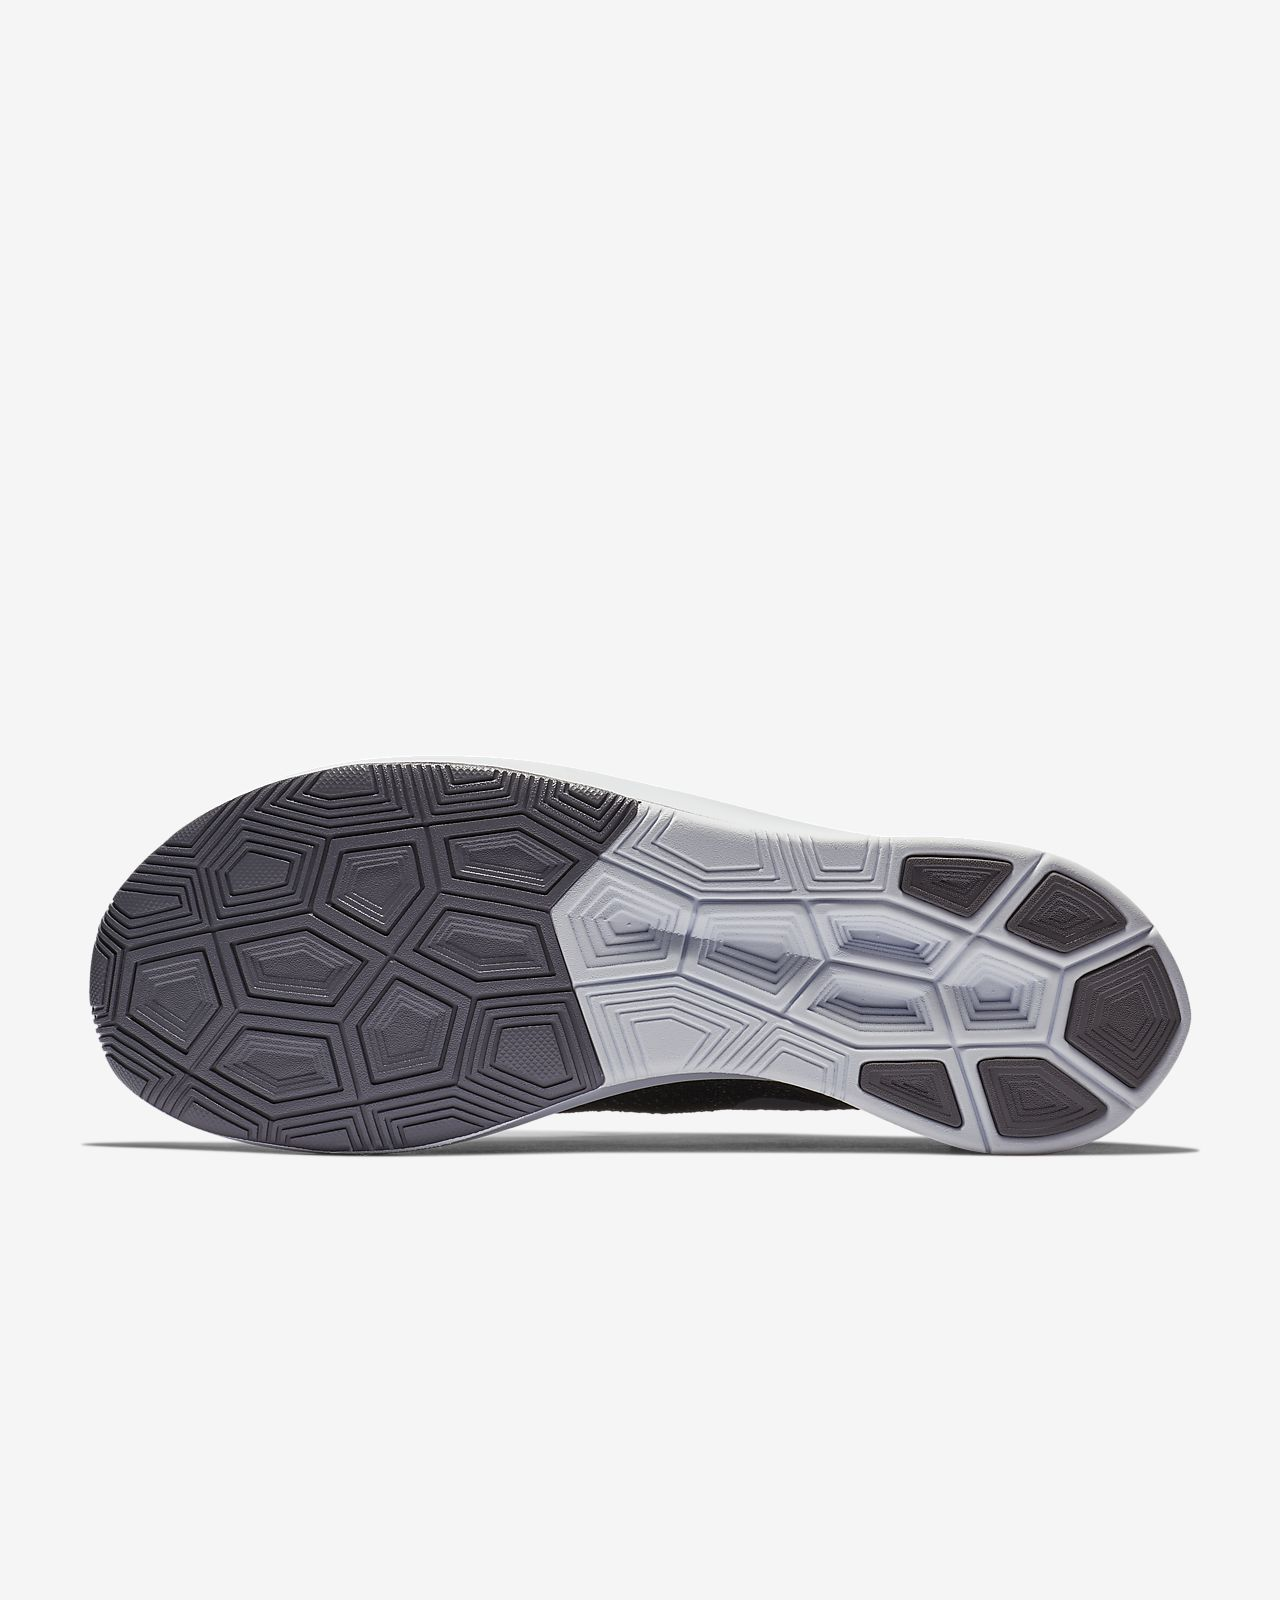 Nike Zoom Fly Flyknit Zapatillas de running - Hombre. Nike.com ES 4327bf1d94072